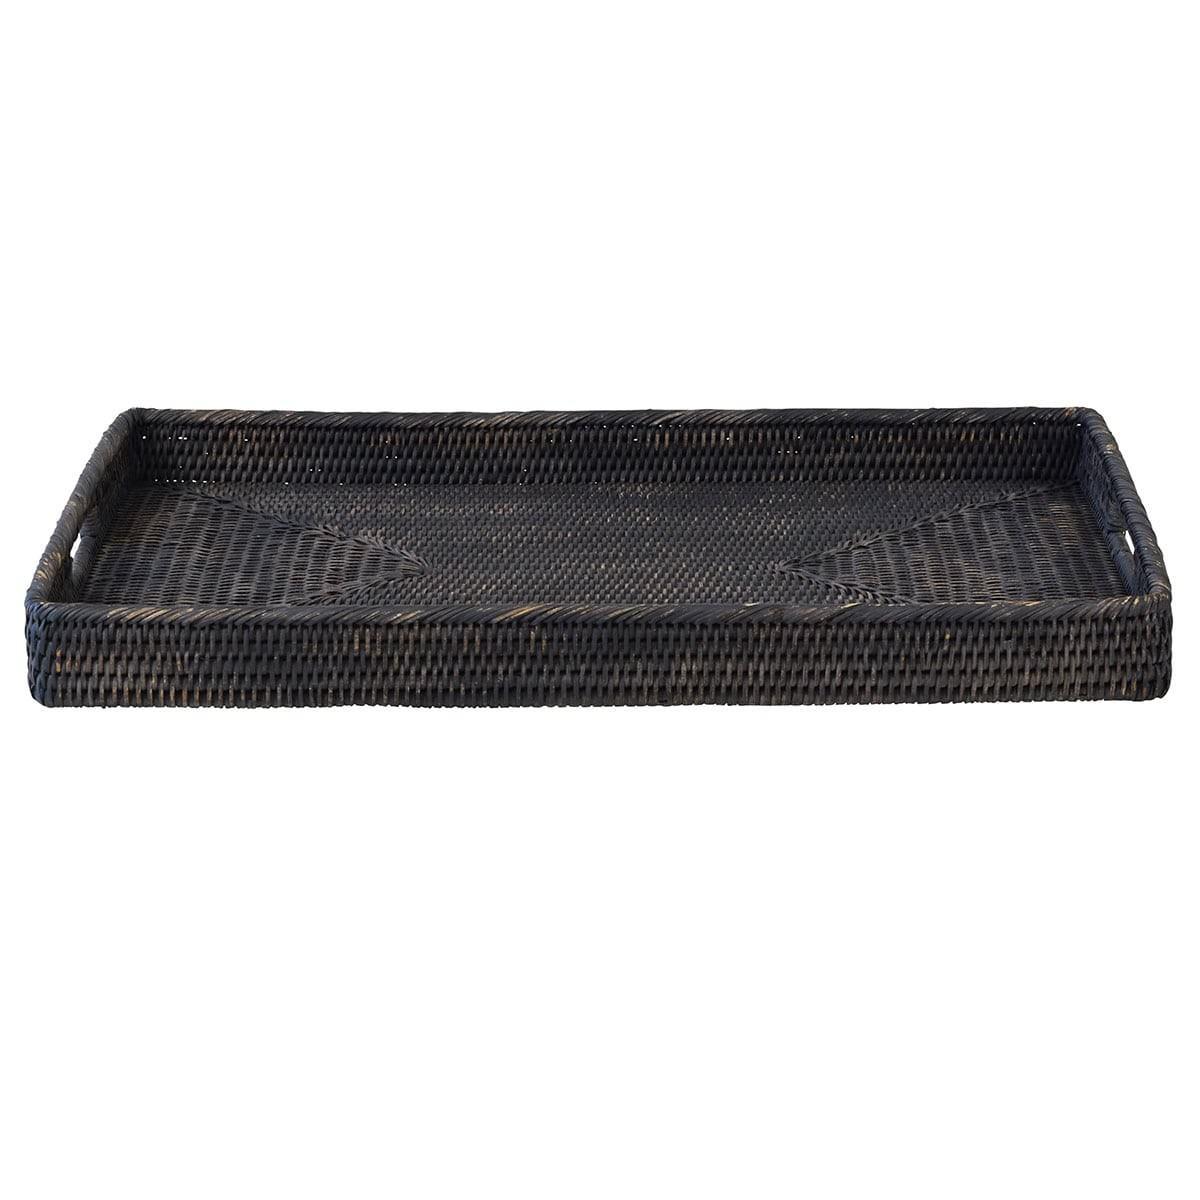 Savannah Rattan Tray, Rectangle, Large, Charcoal